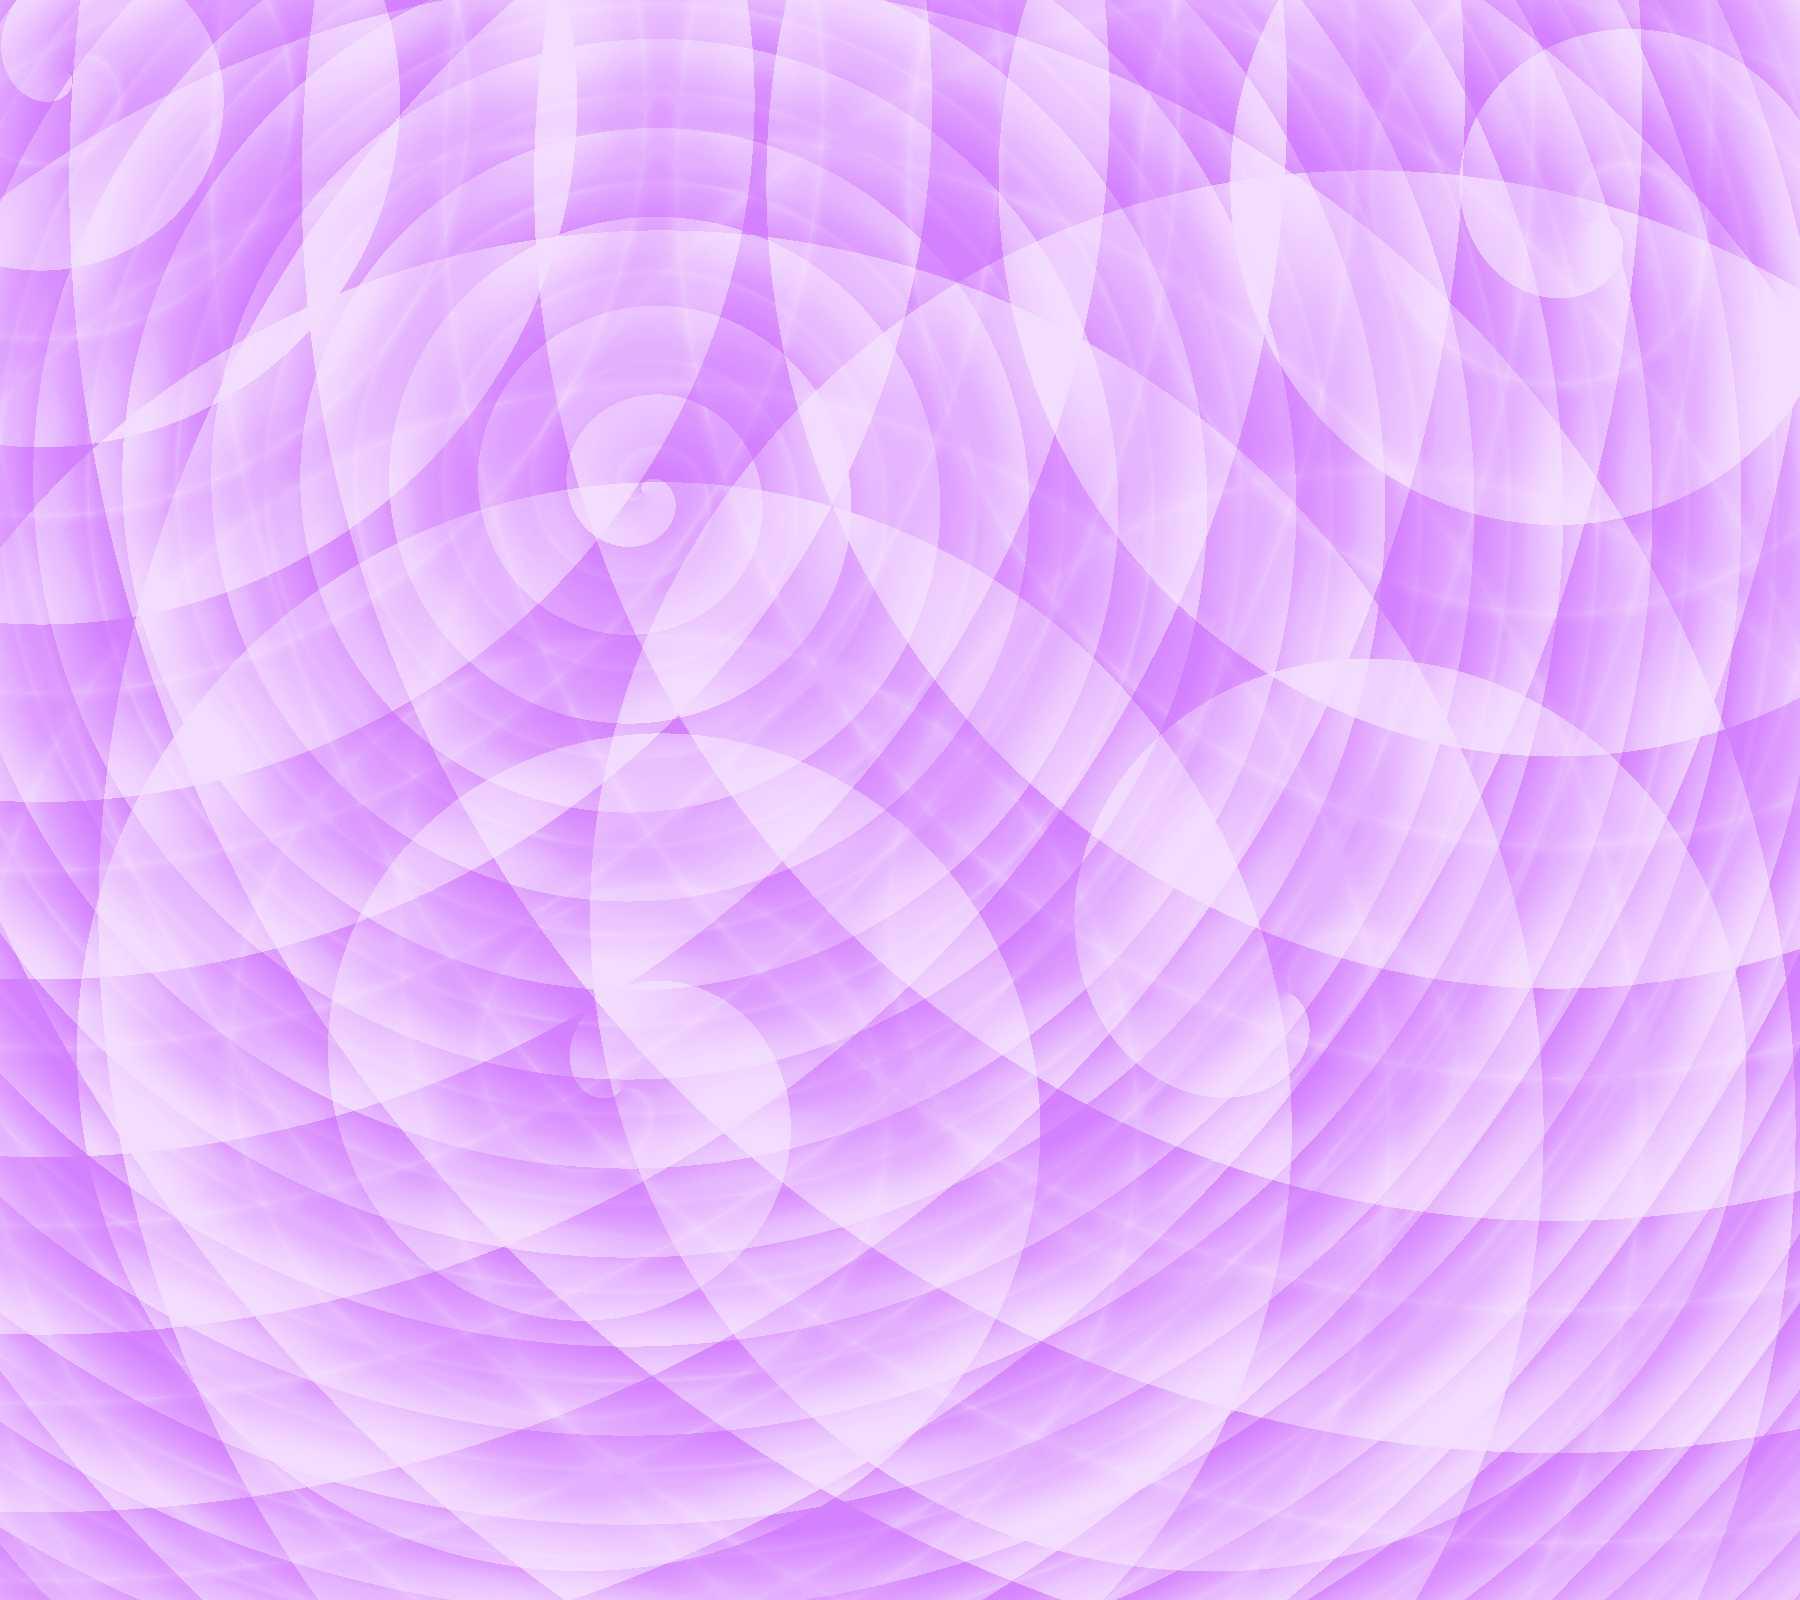 Lavender Color Wallpapers - Wallpaper Cave - photo#19